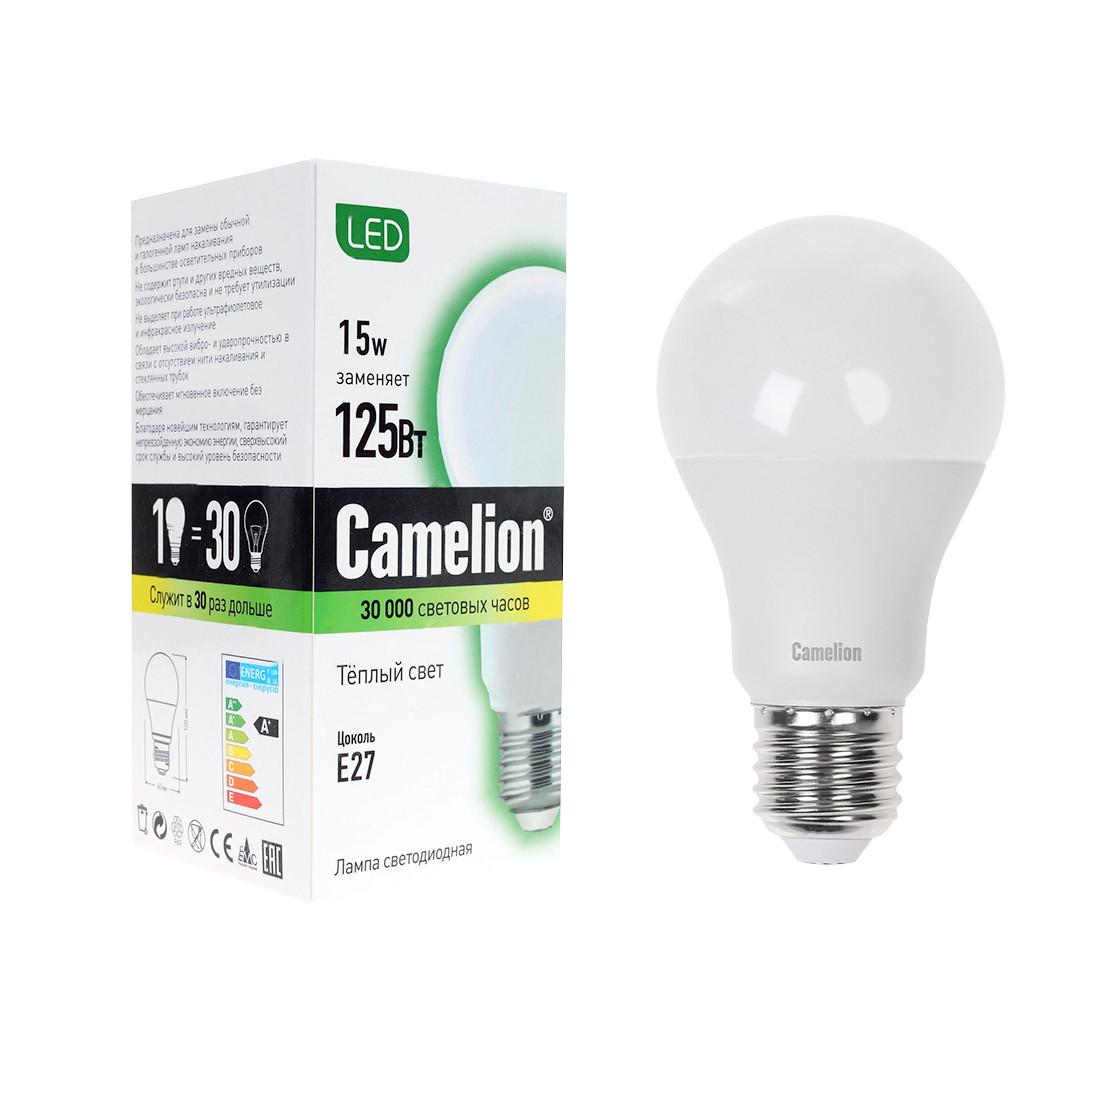 Эл. лампа светодиодная  Camelion  LED15-A60/830/E27